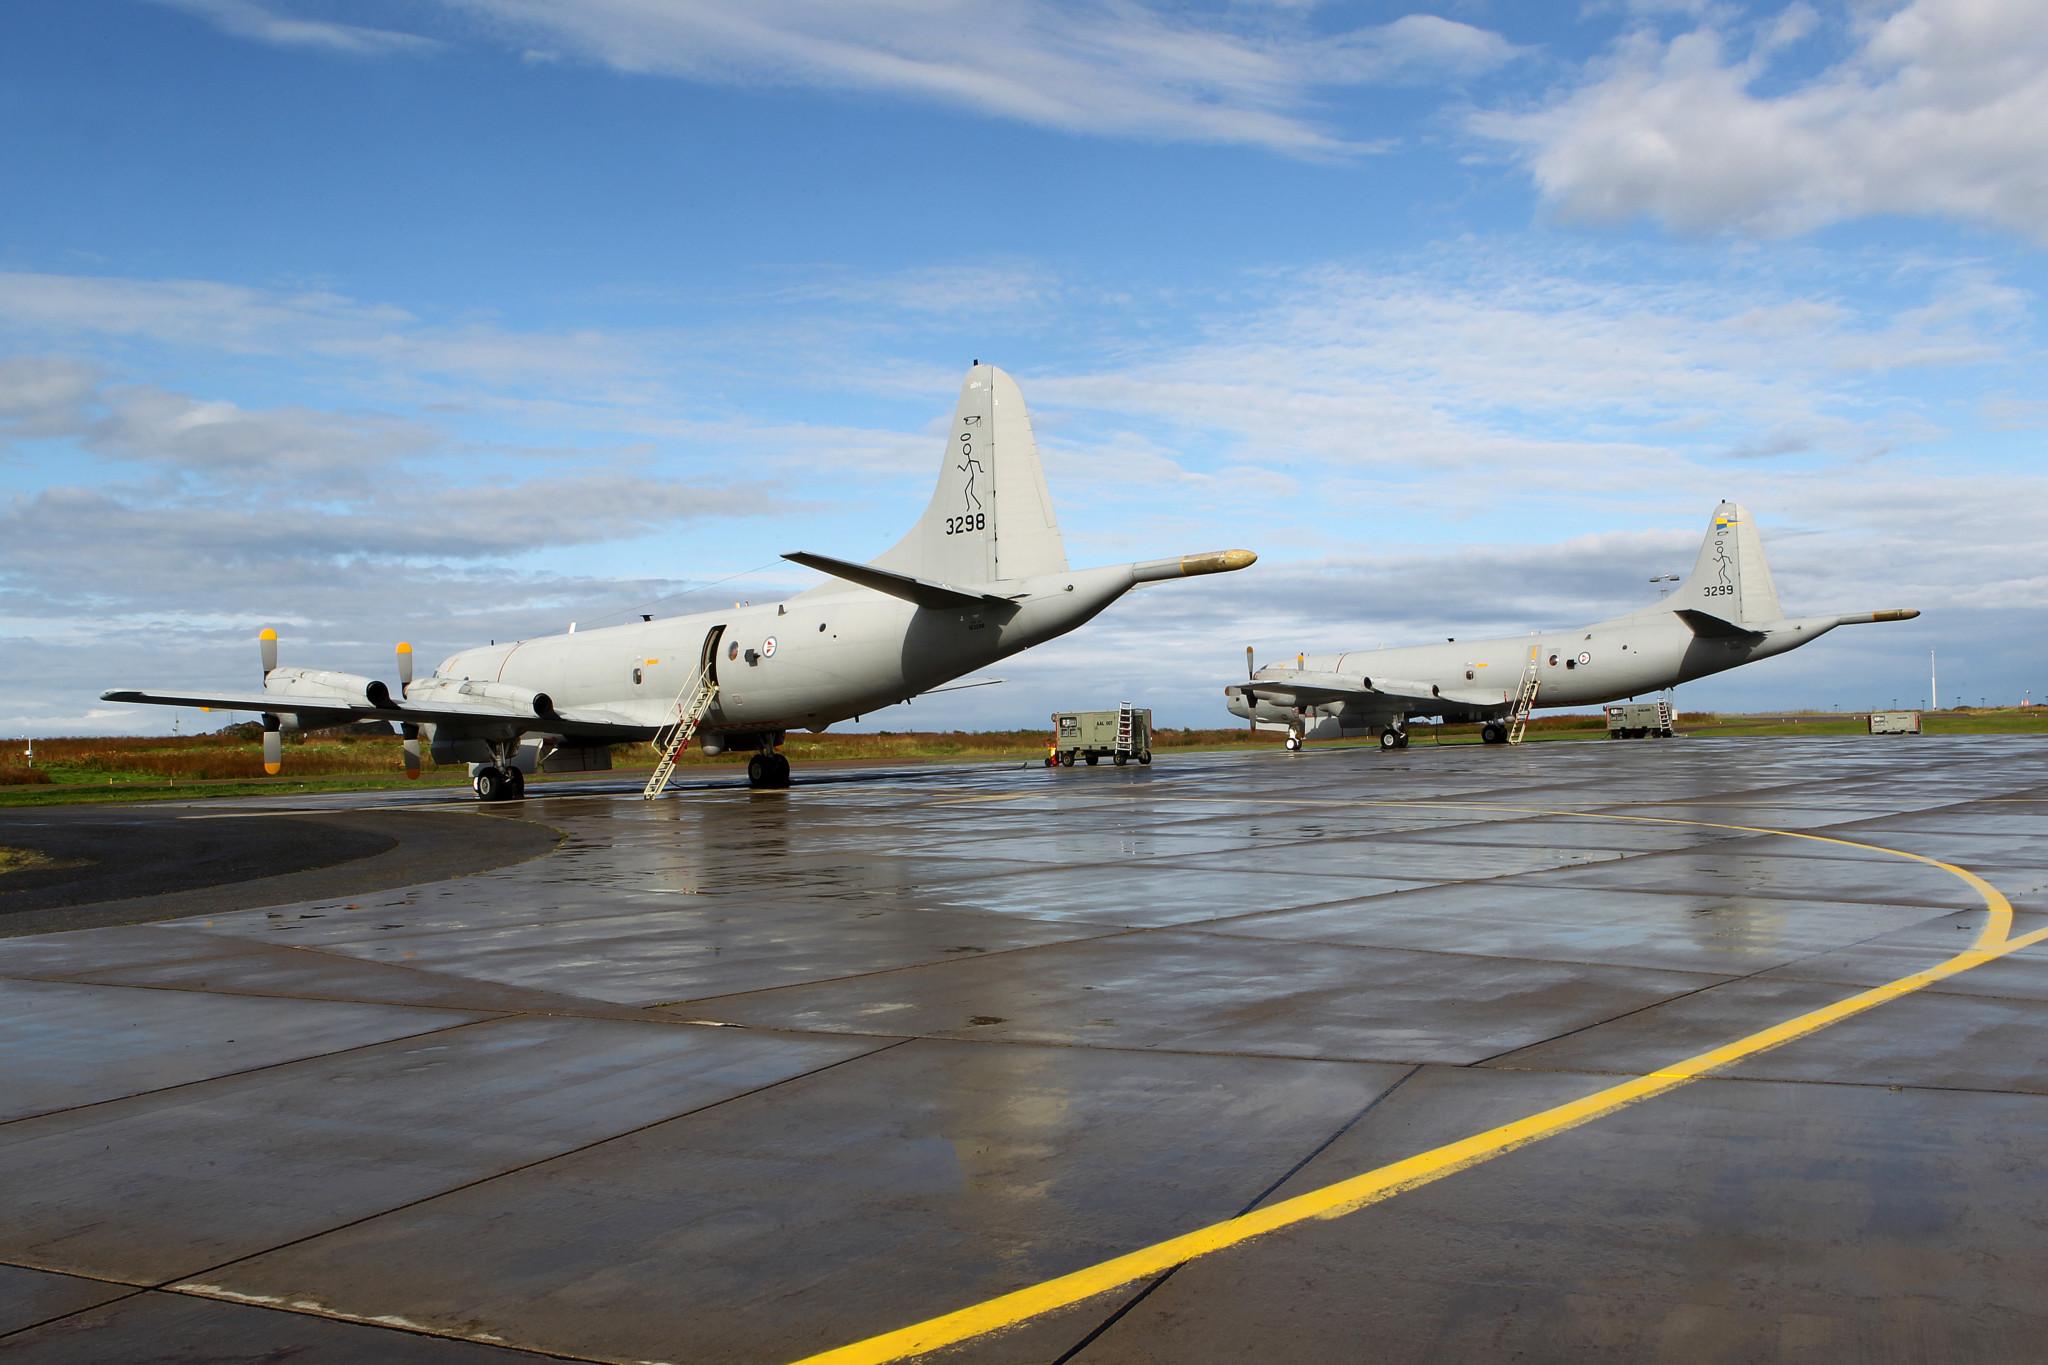 Erfaren flykaptein: – Uforståelig flytting fra Andøya